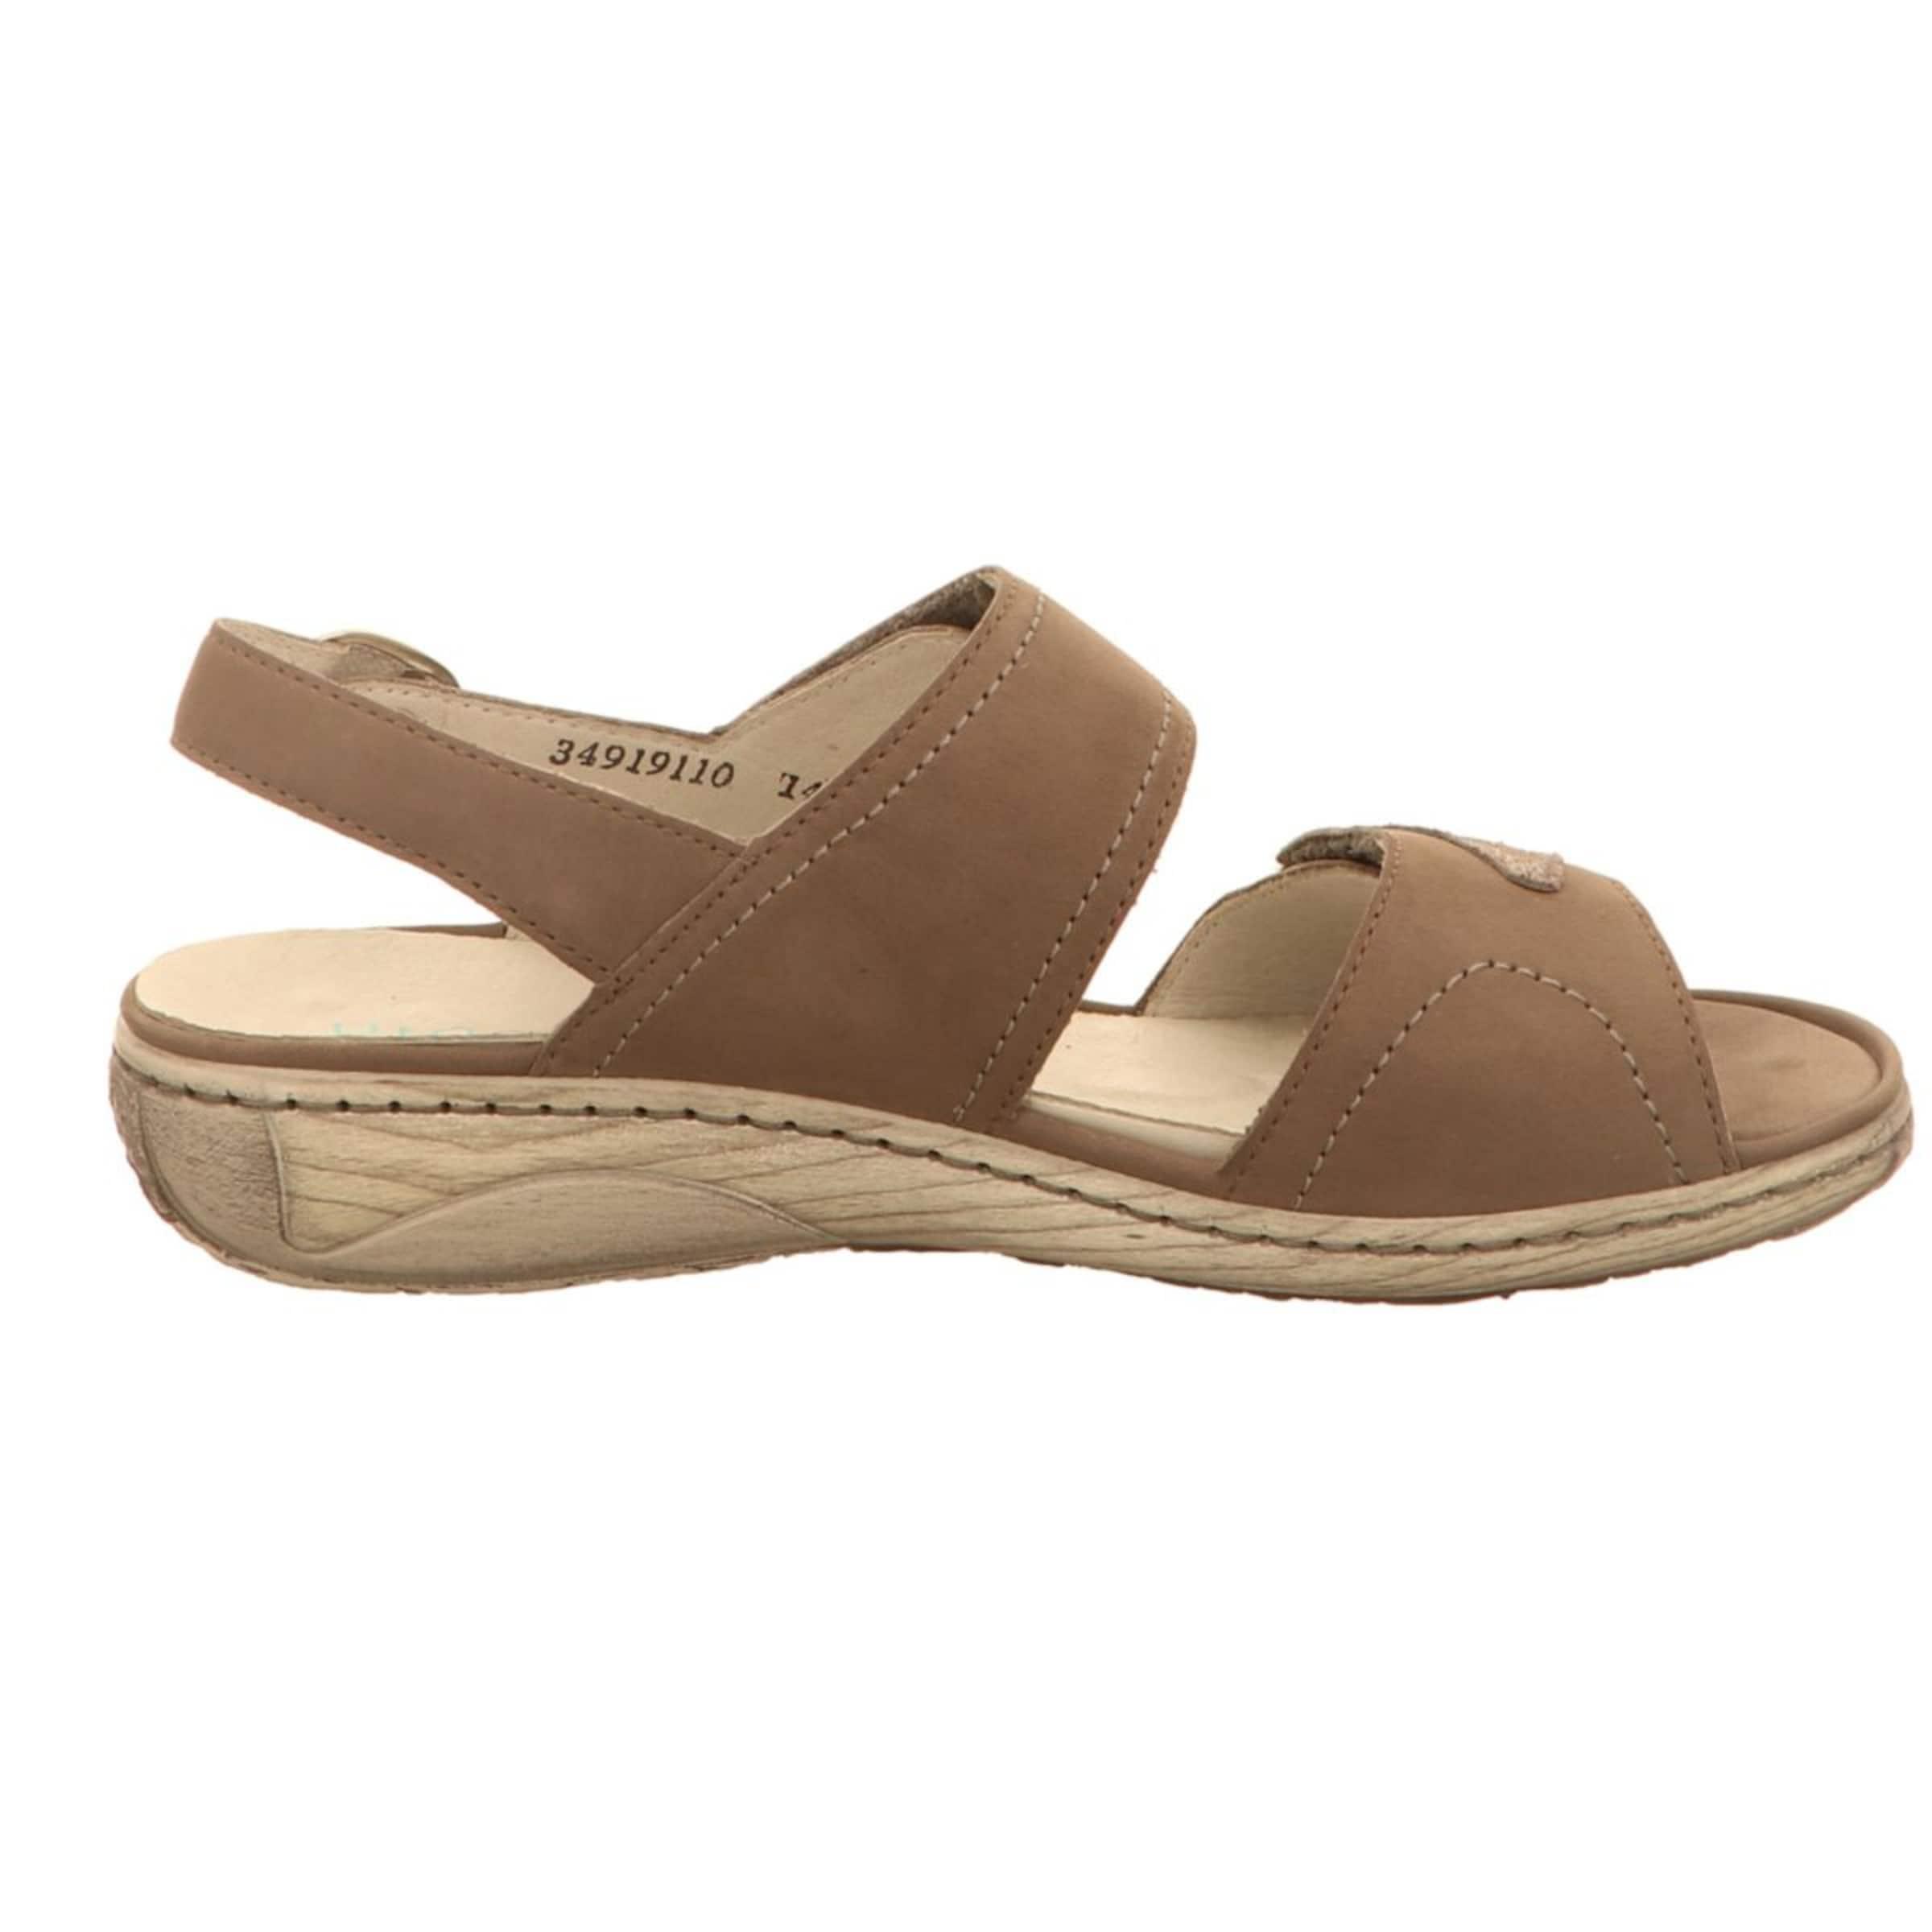 WALDLÄUFER Sandale in hellbraun